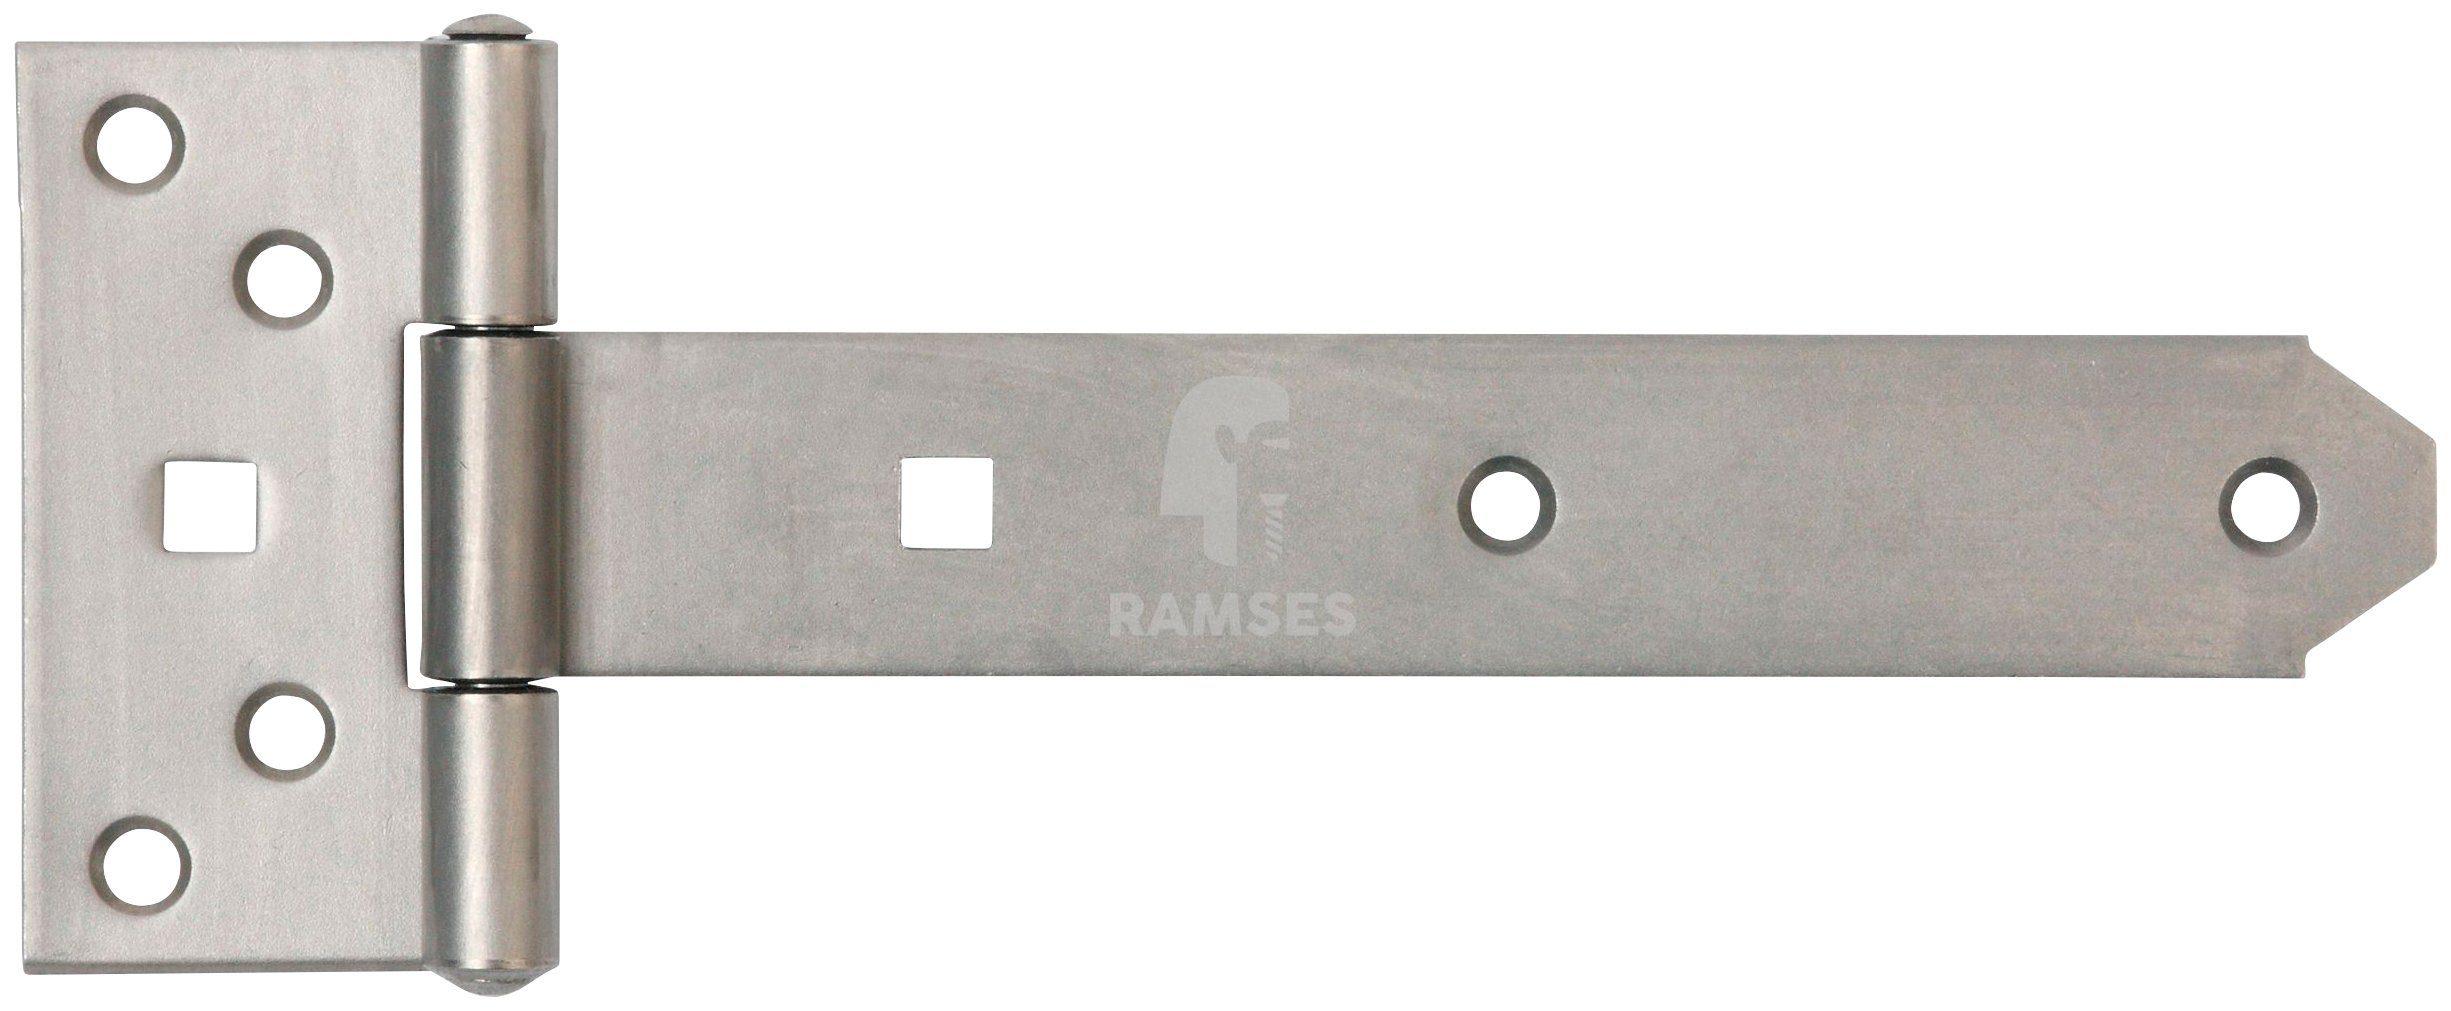 RAMSES Kreuzgehänge , 39 X 200 X 34 X 2,75 mm Edelstahl A2